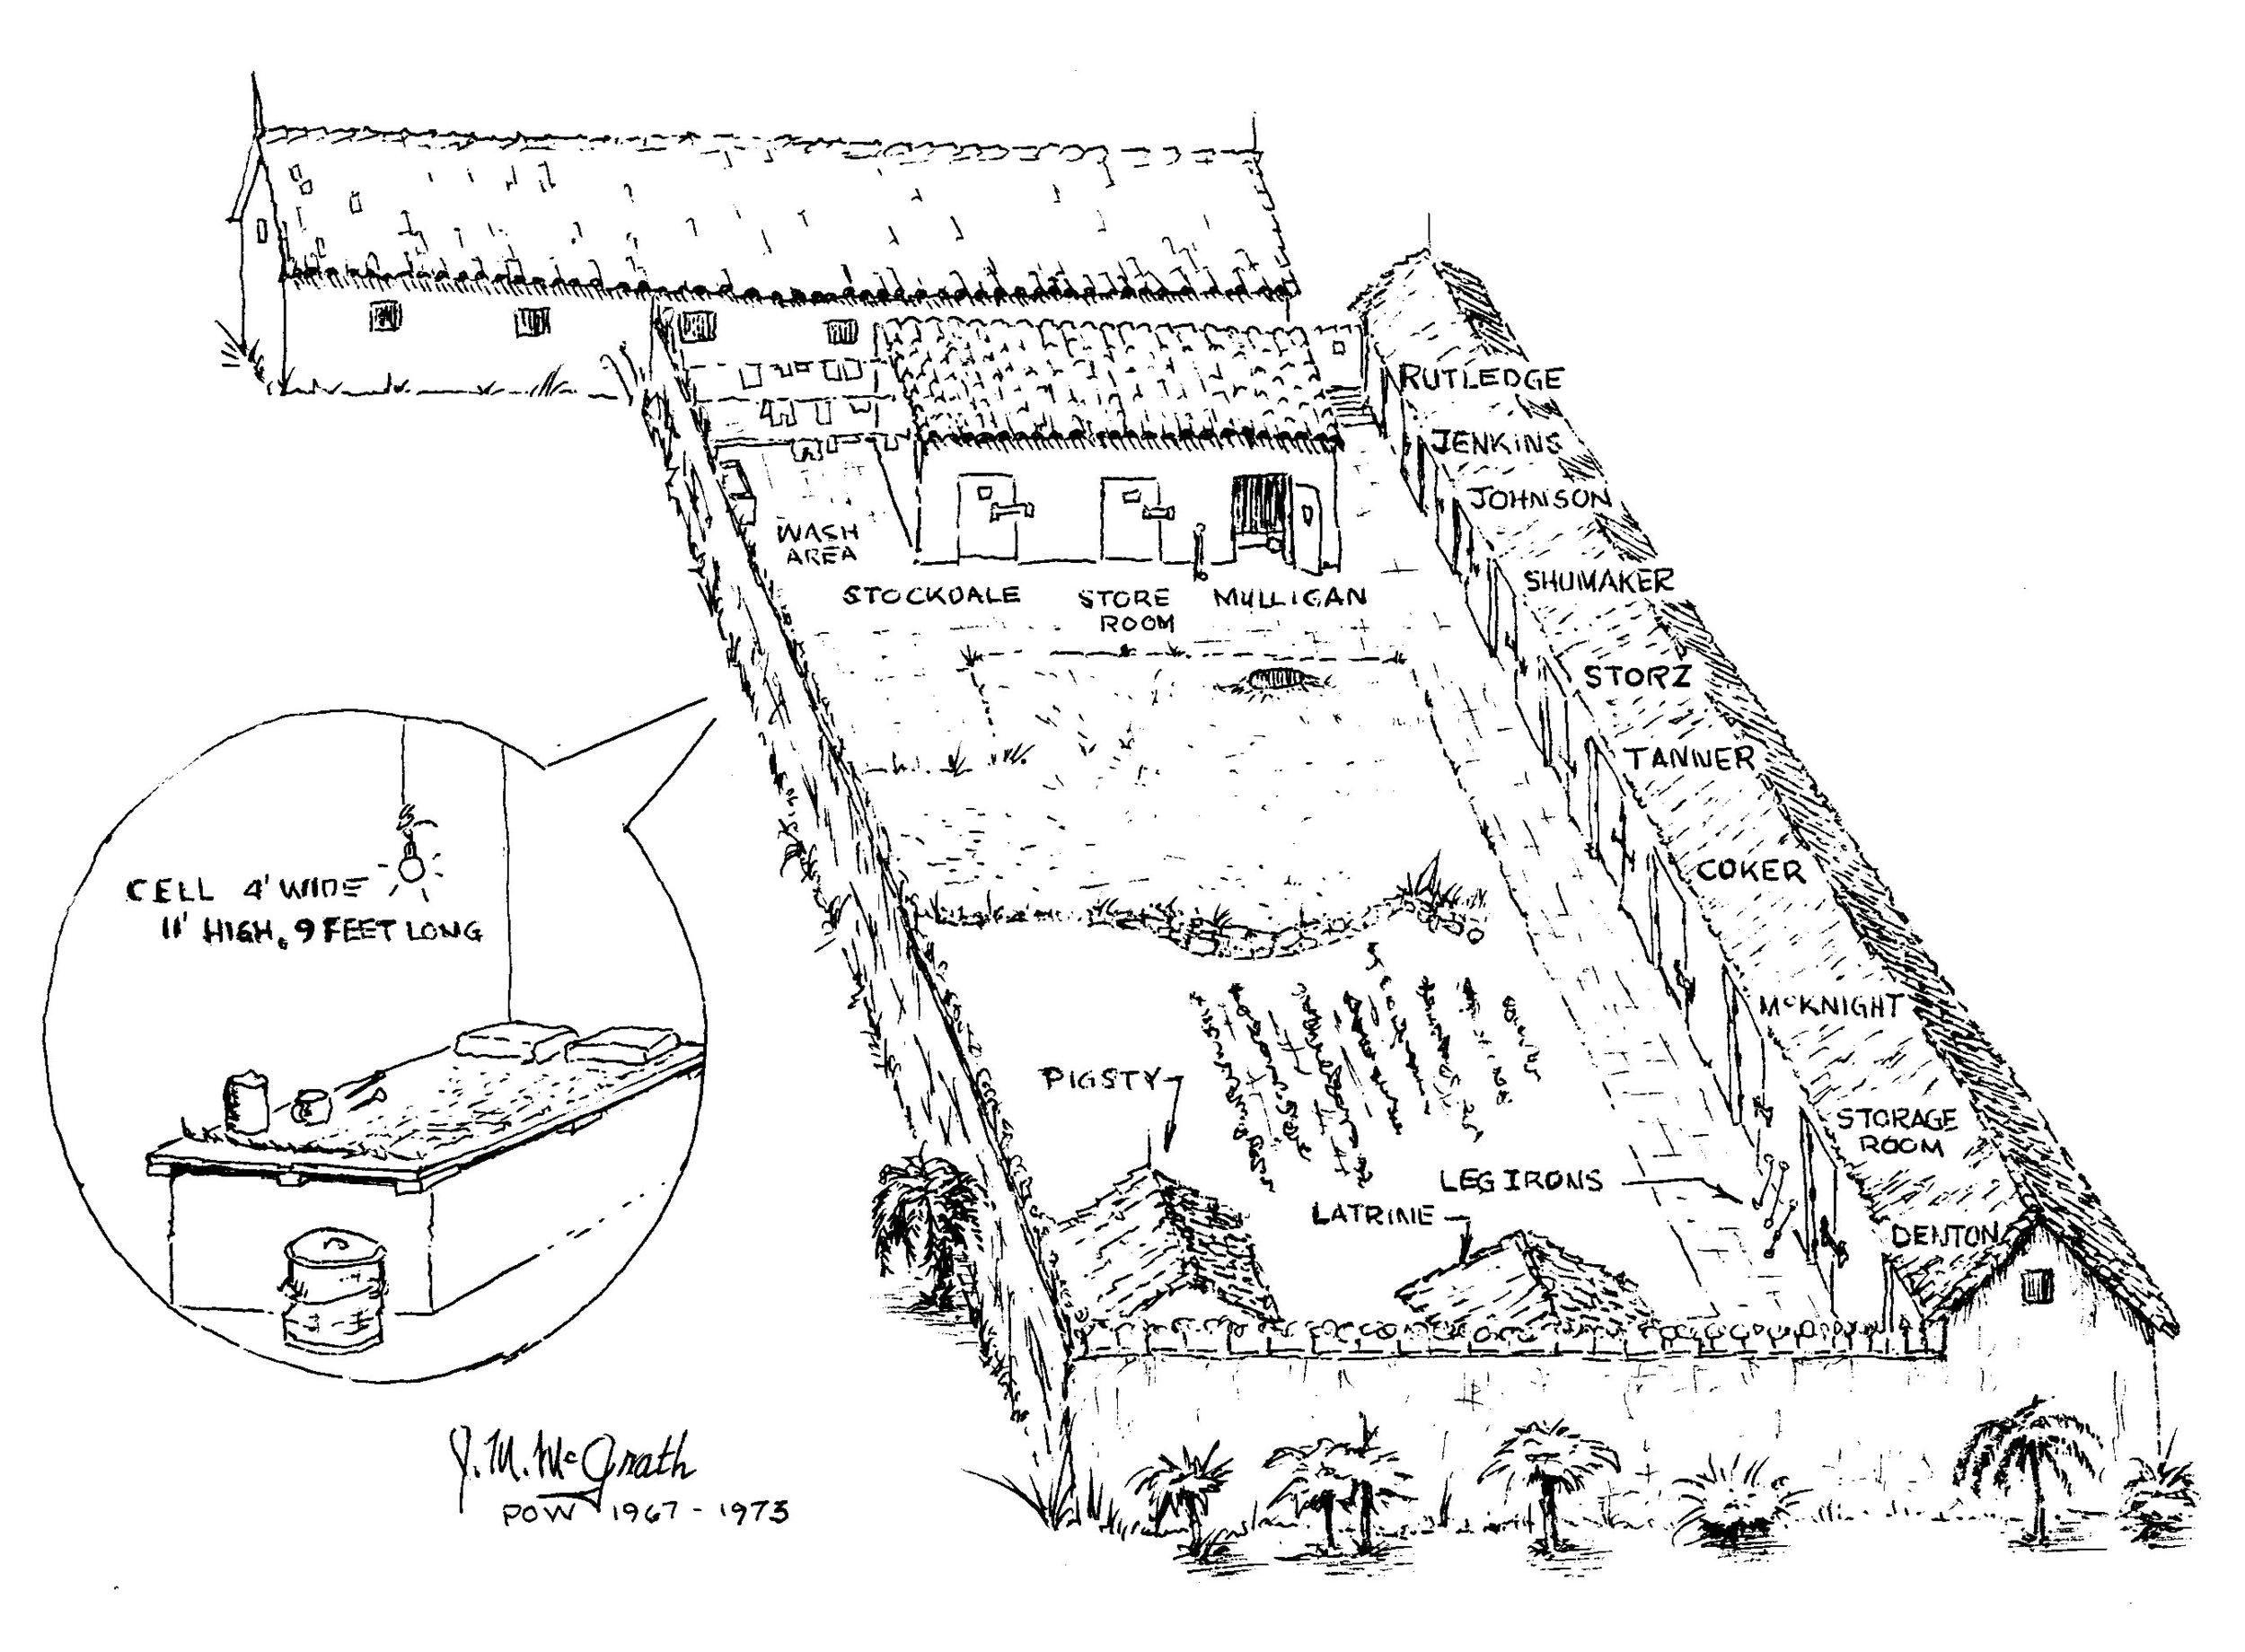 mcgrath(nypost)_hoa-lo-prison_c.1970s.jpg